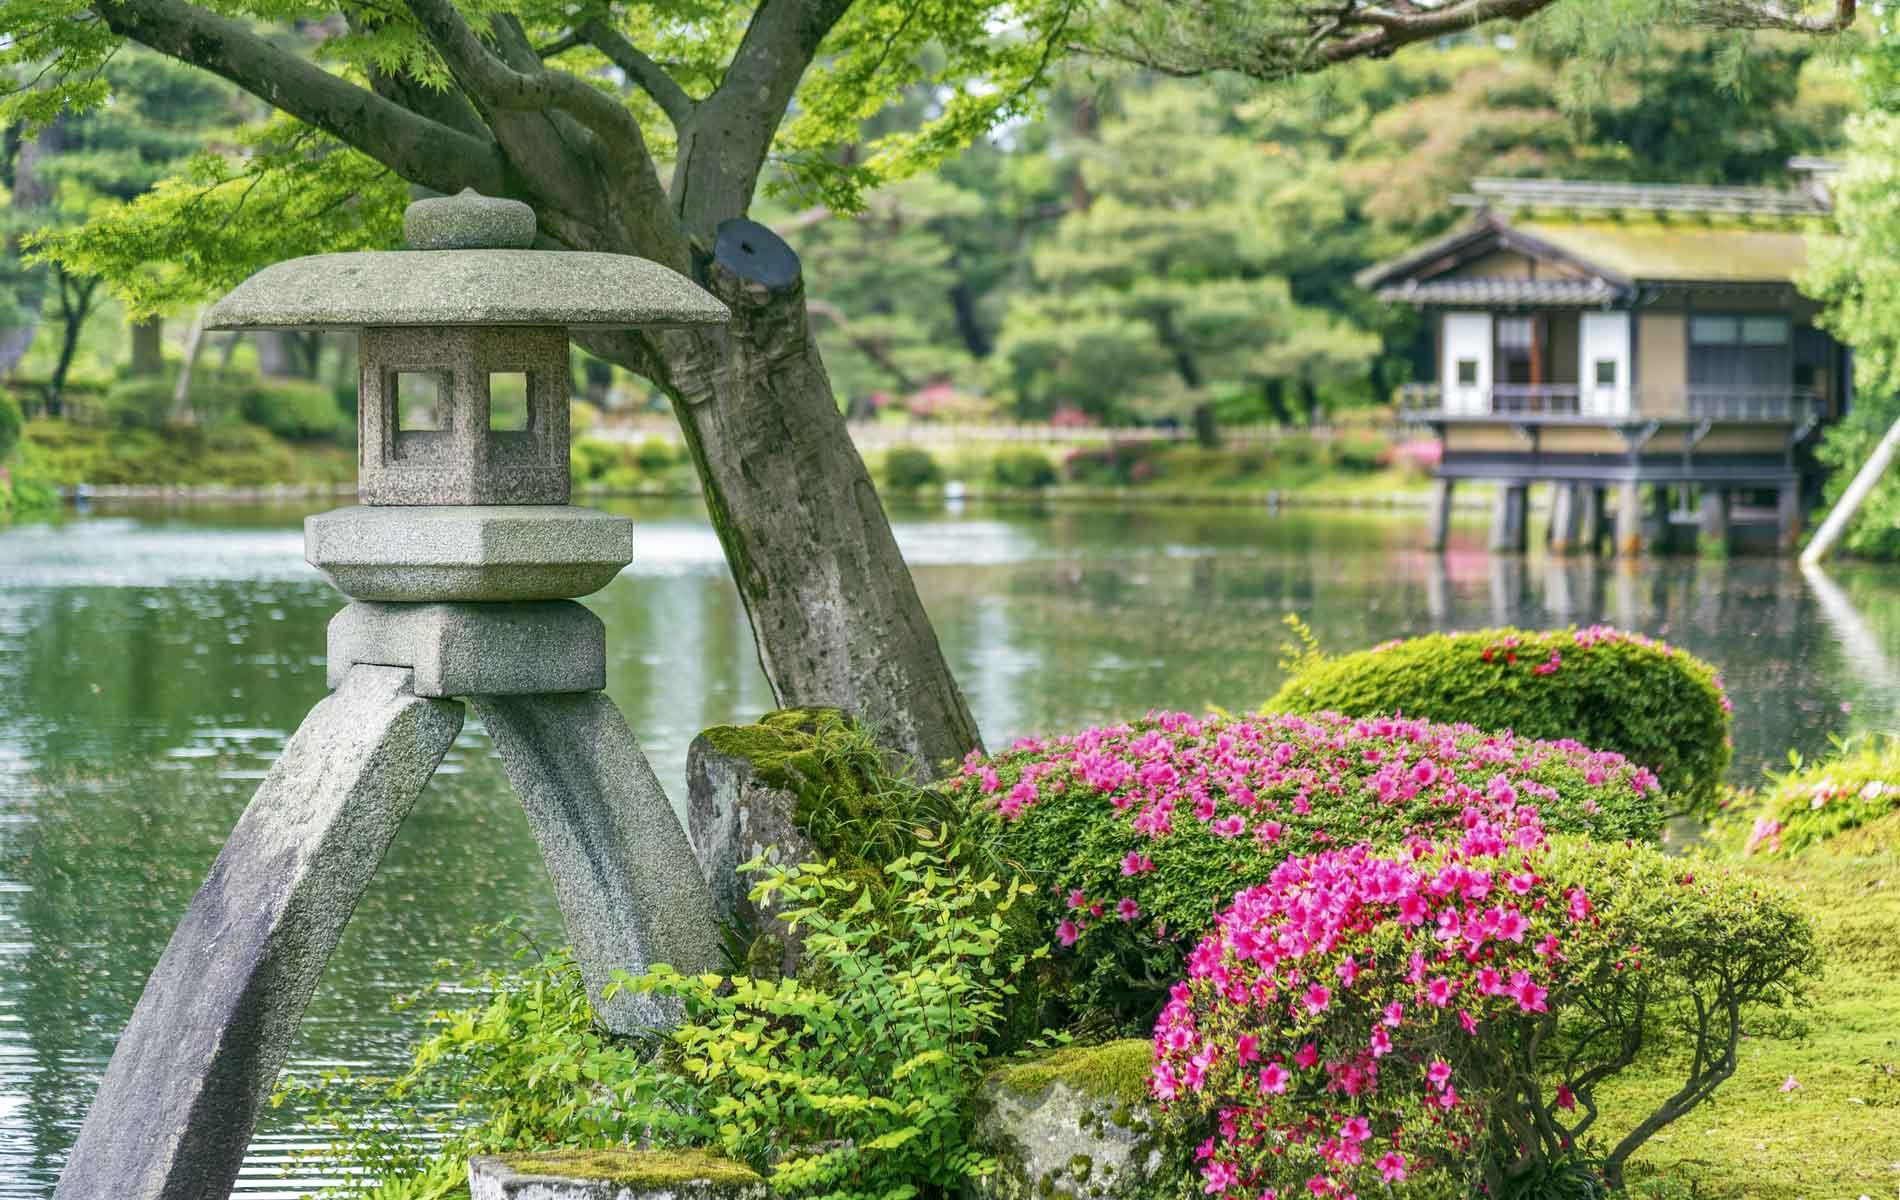 Stone Lantern in the Kenrokuen Gardens in Kanazawa, Japan